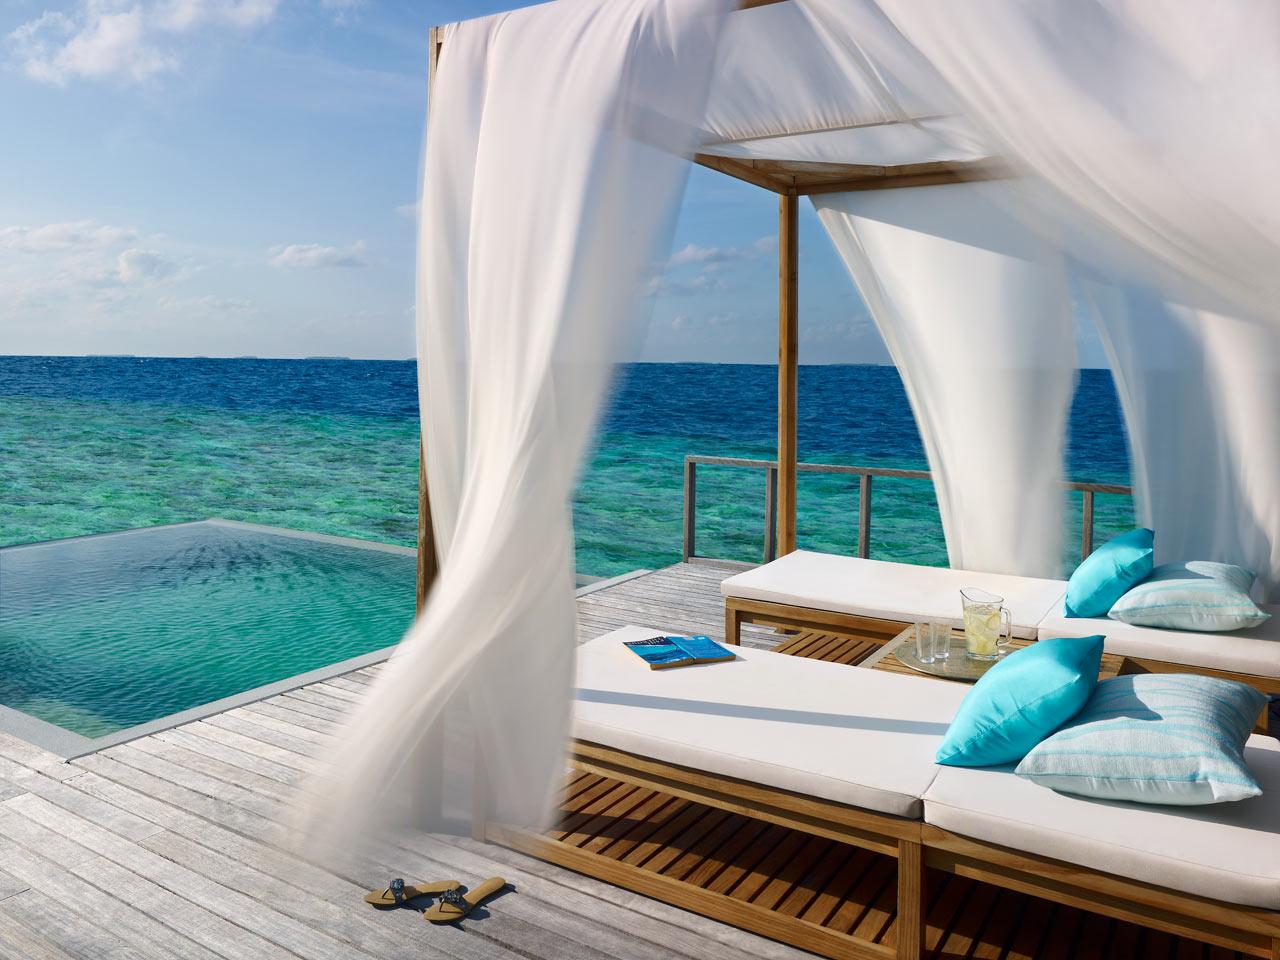 Dusit-Thani-Maldives-Hotel-Resort-14